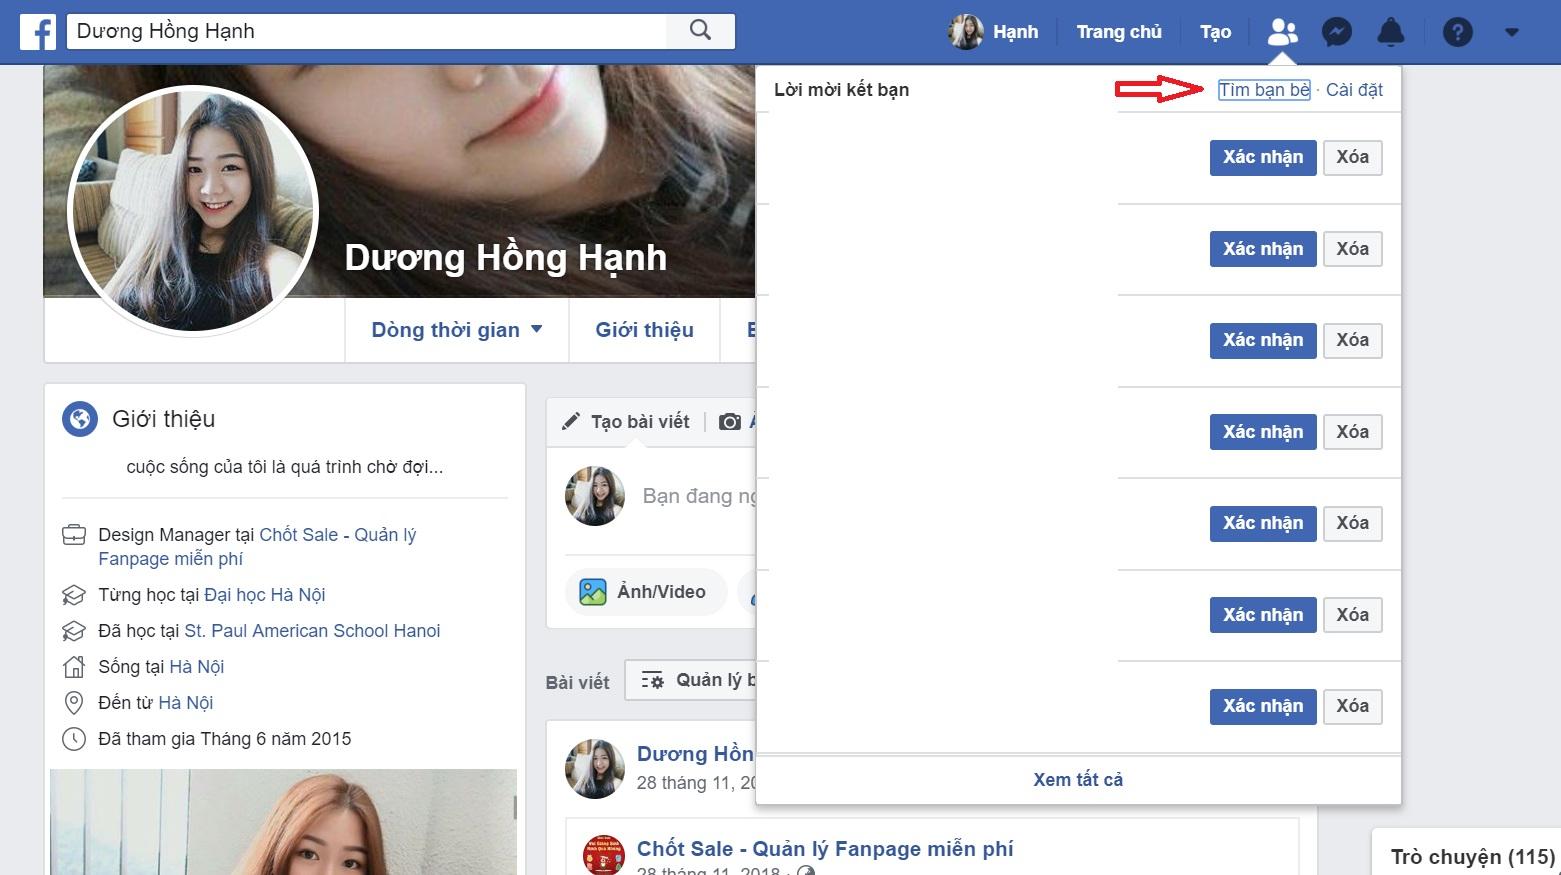 cách tăng lượt theo dõi facebook